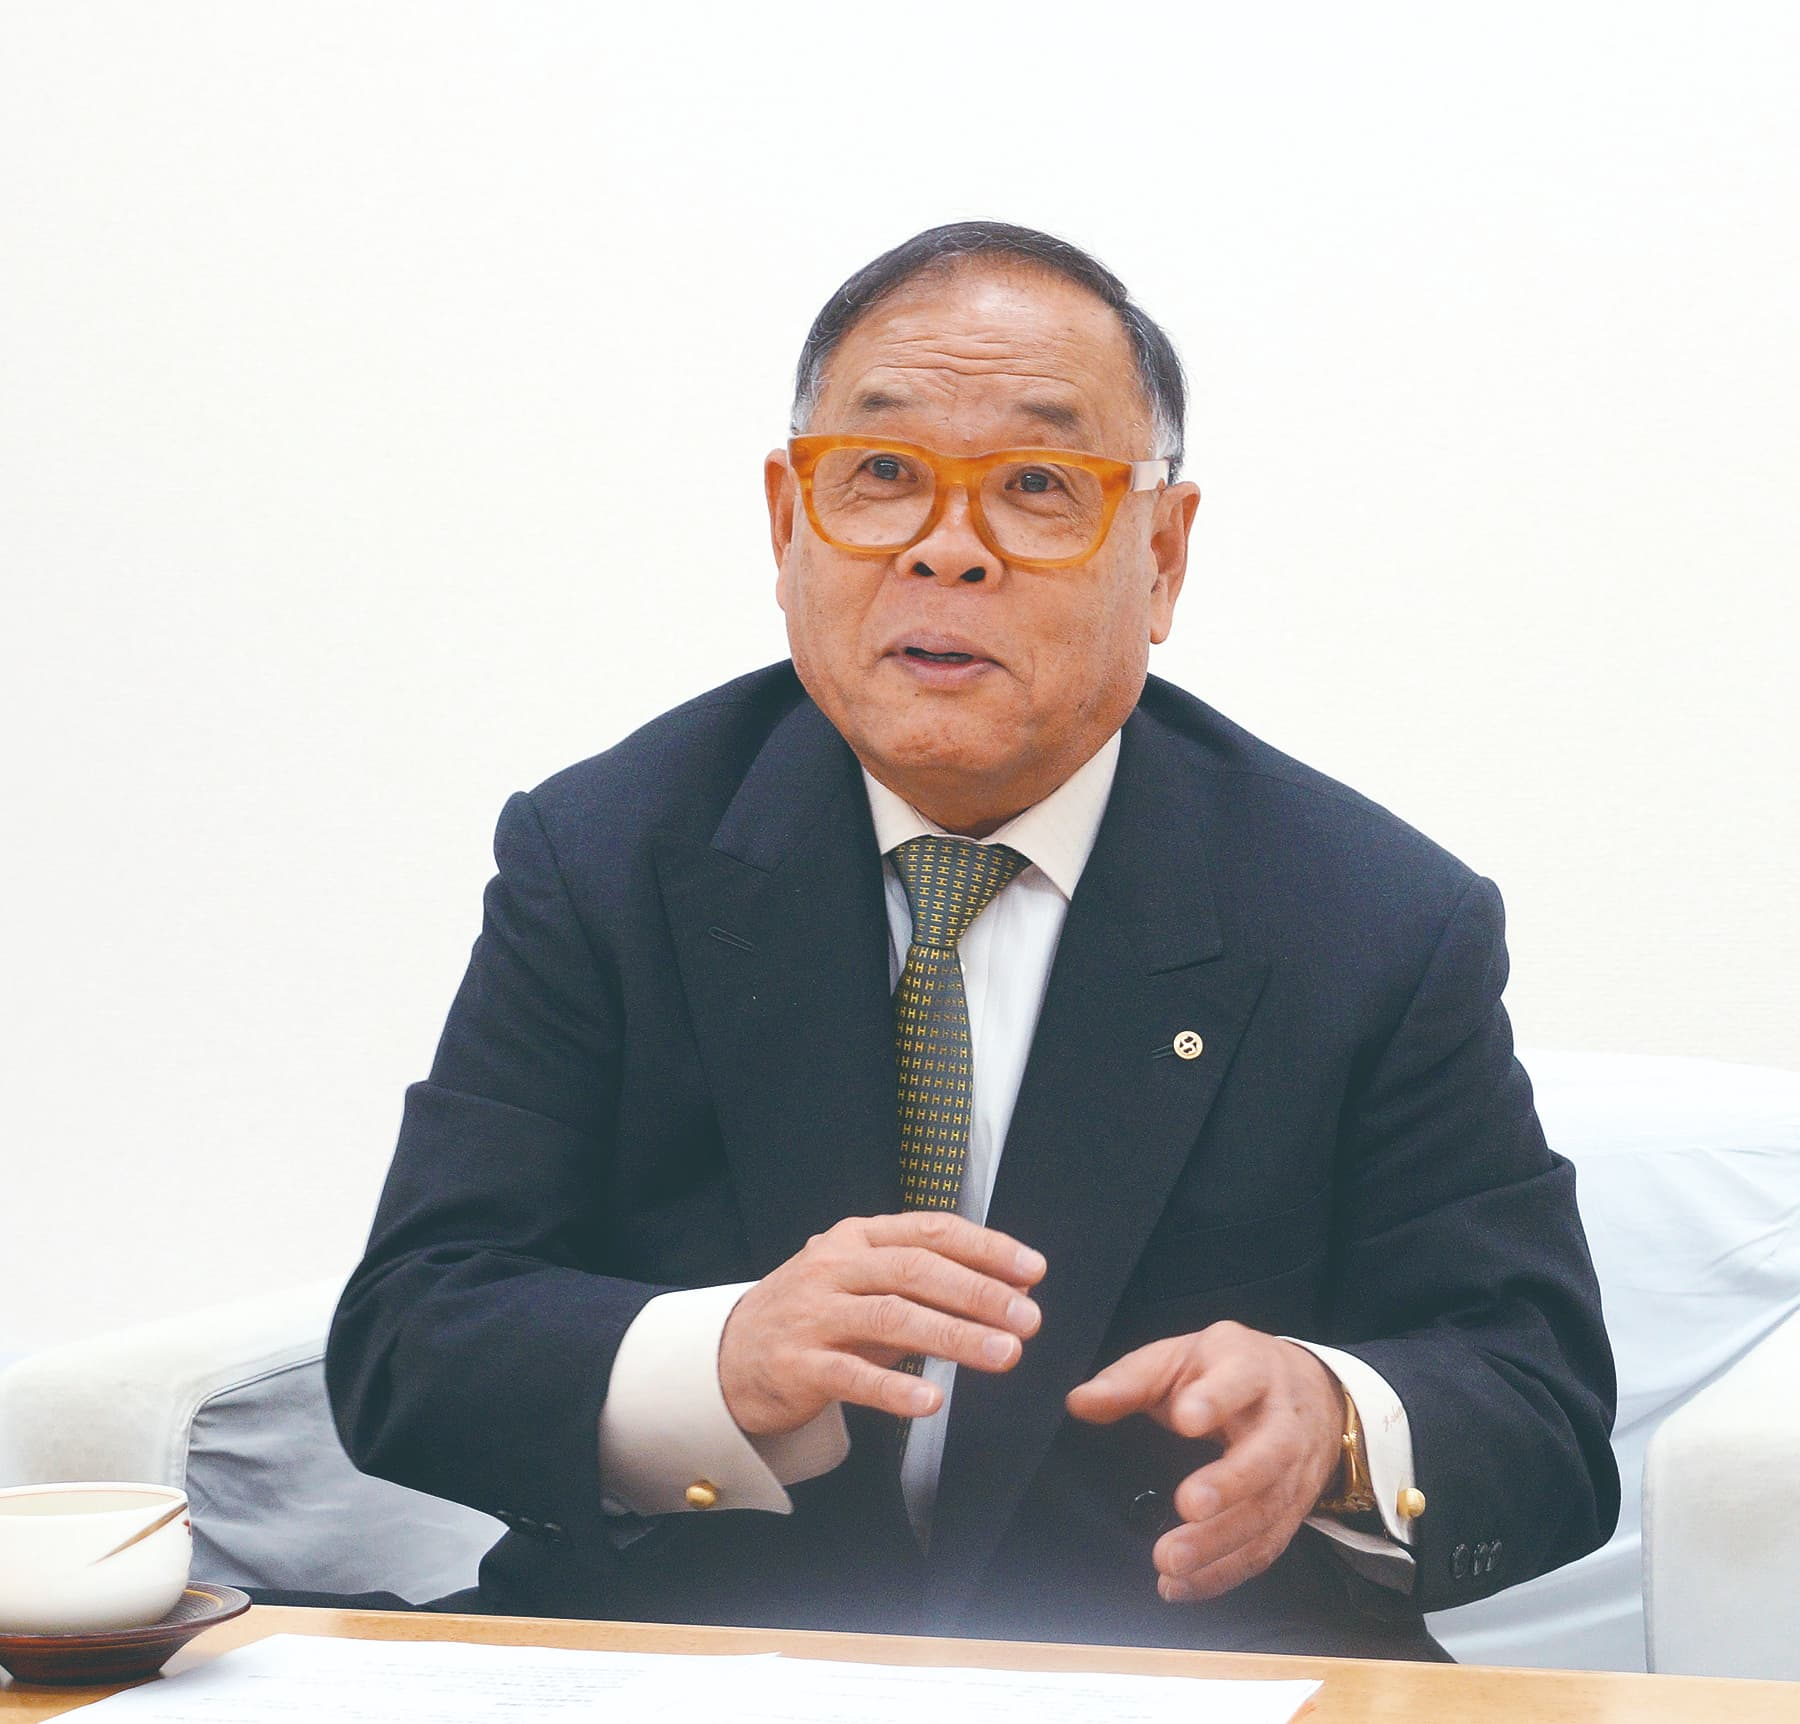 https://course-kagawa.com/wp-content/uploads/2020/03/rakuraku_14.jpg